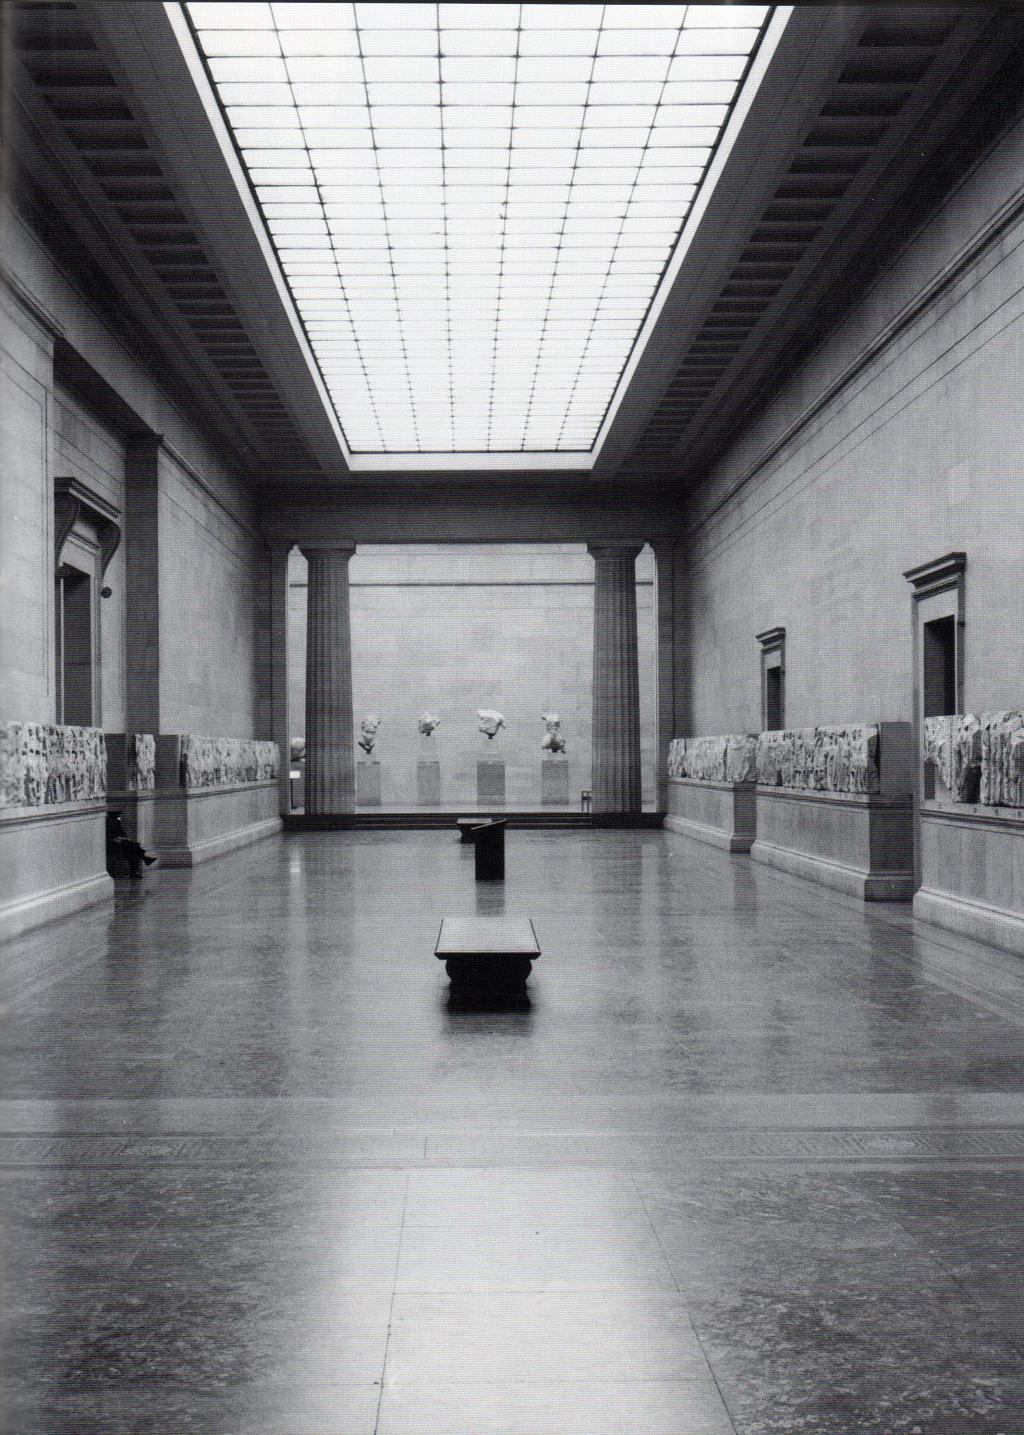 galeria Duveen